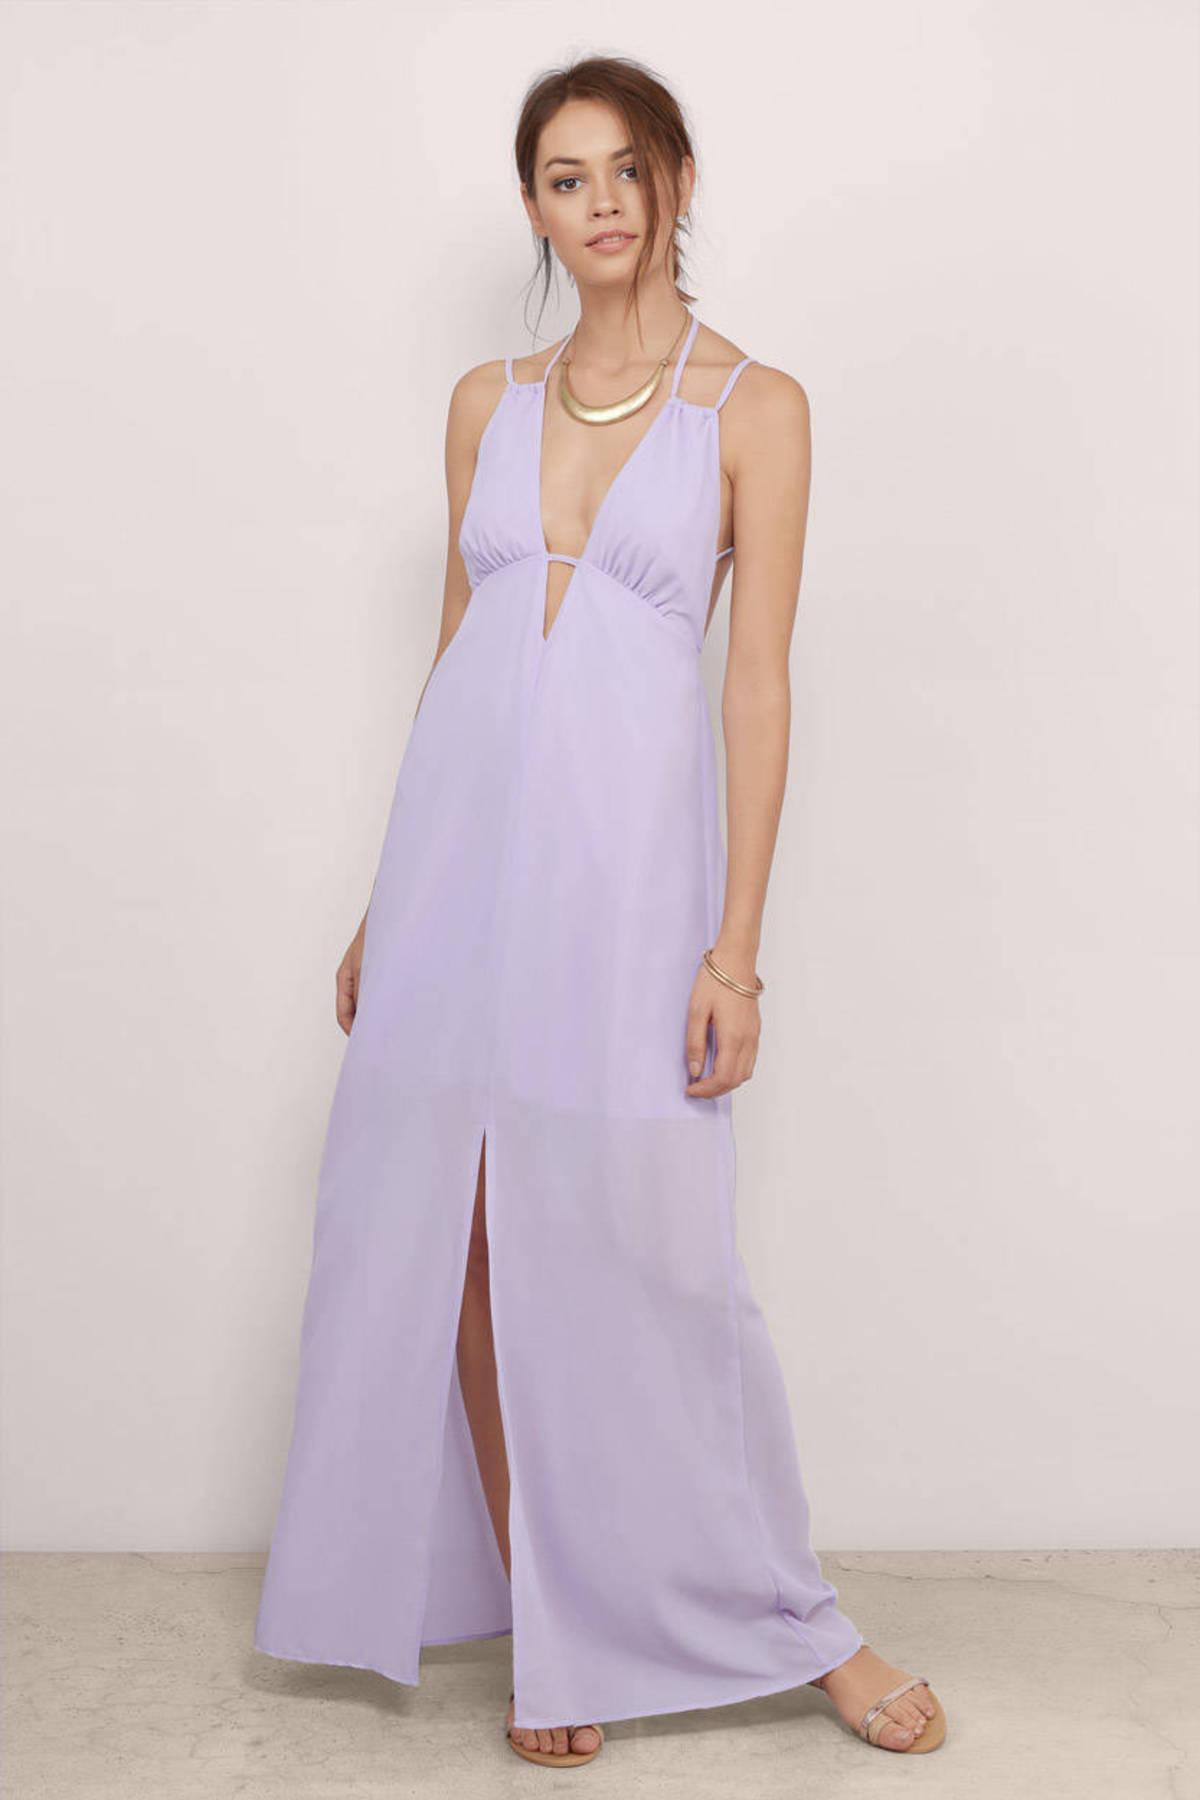 Lavender Maxi Dress - Purple Dress - Plunging Dress - $14.00